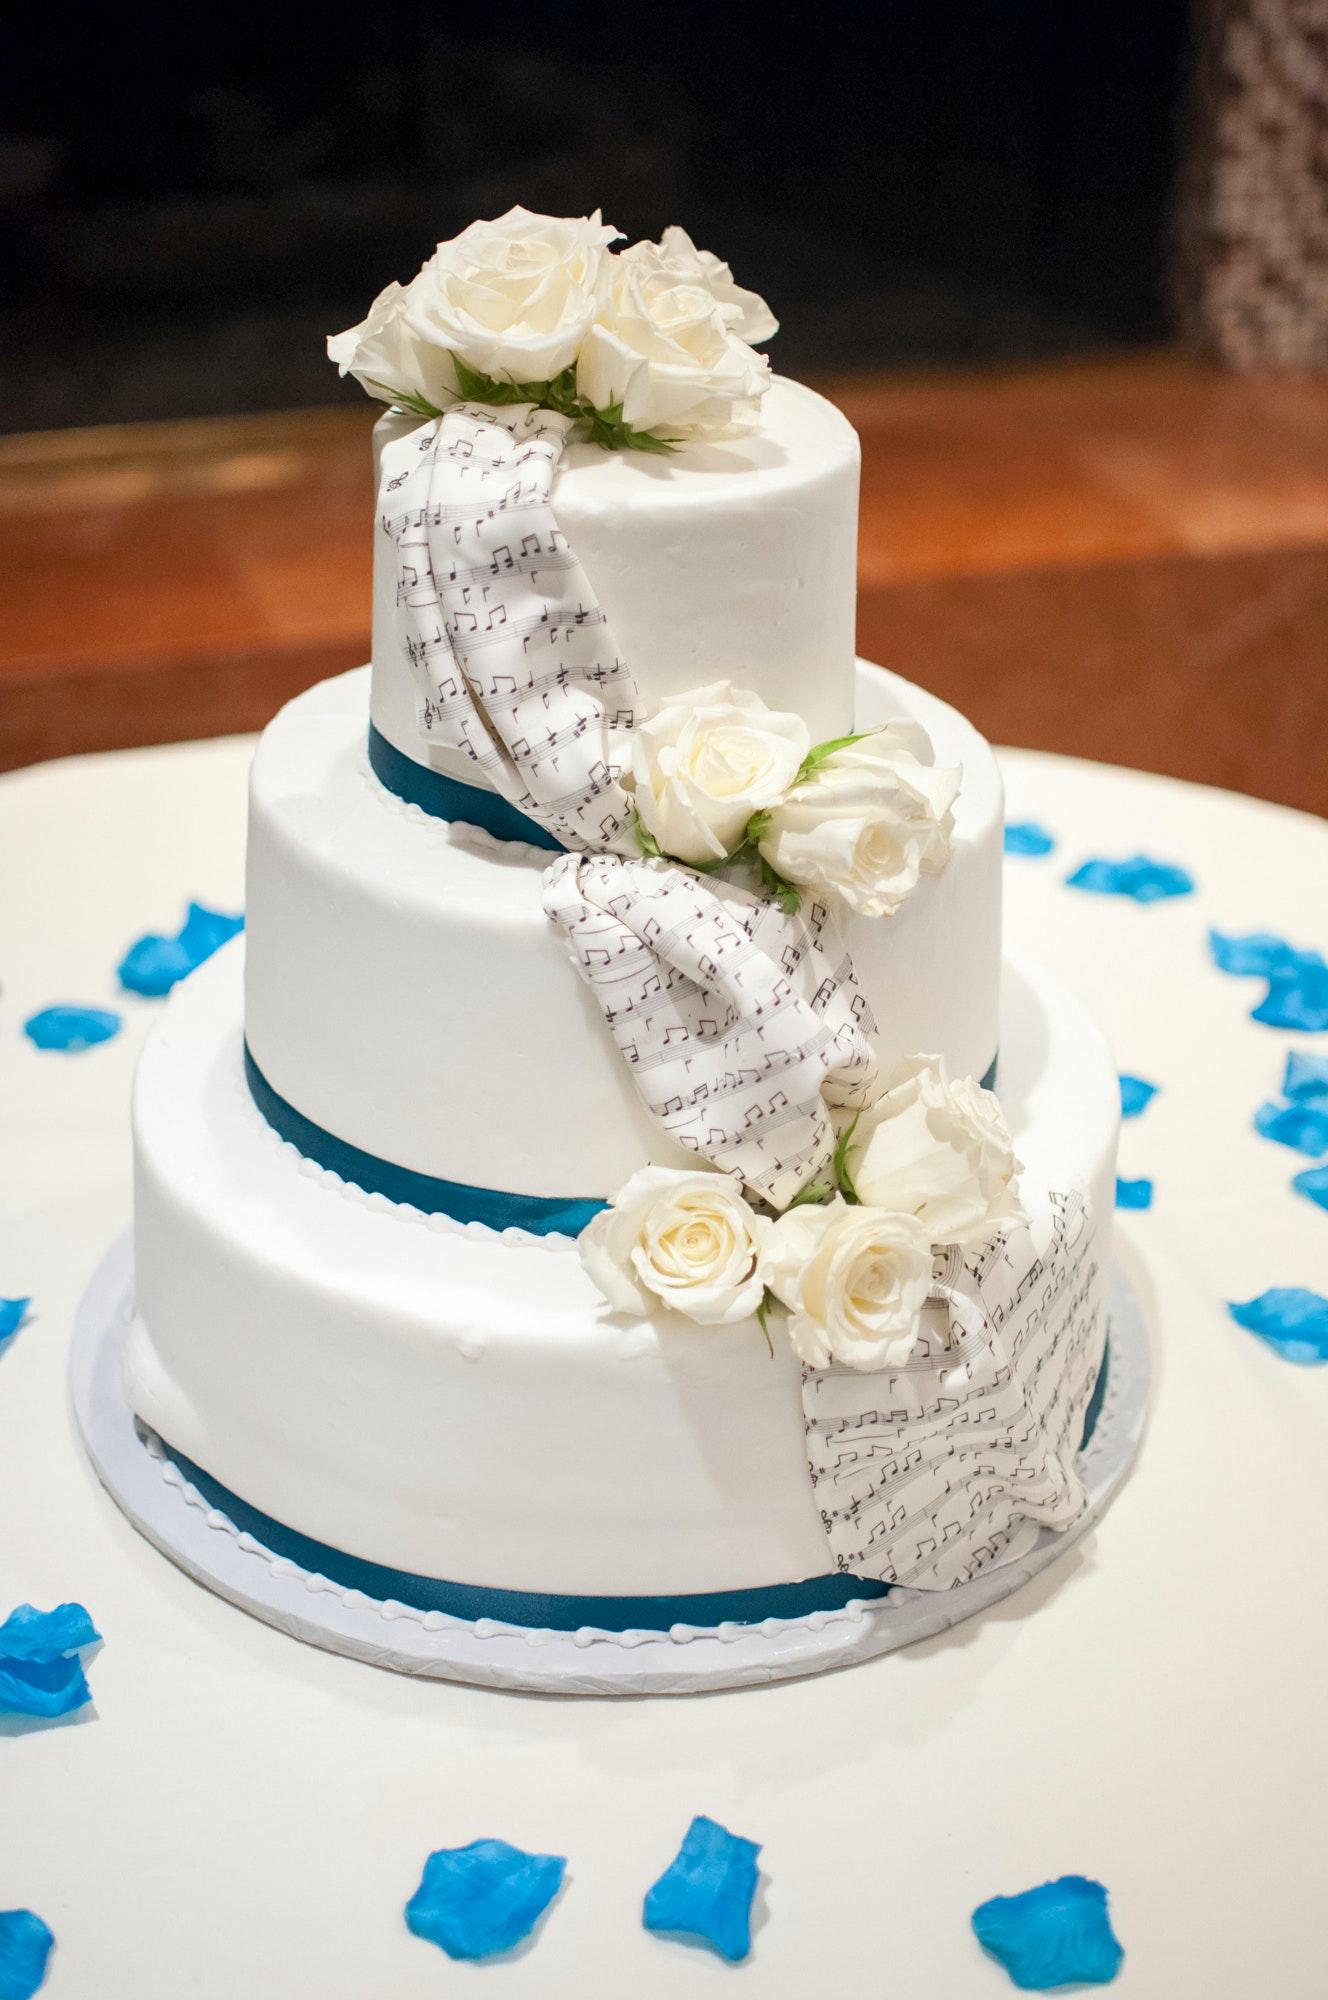 500+ Amazing Birthday Cake Photos Pexels · Free Stock Photos